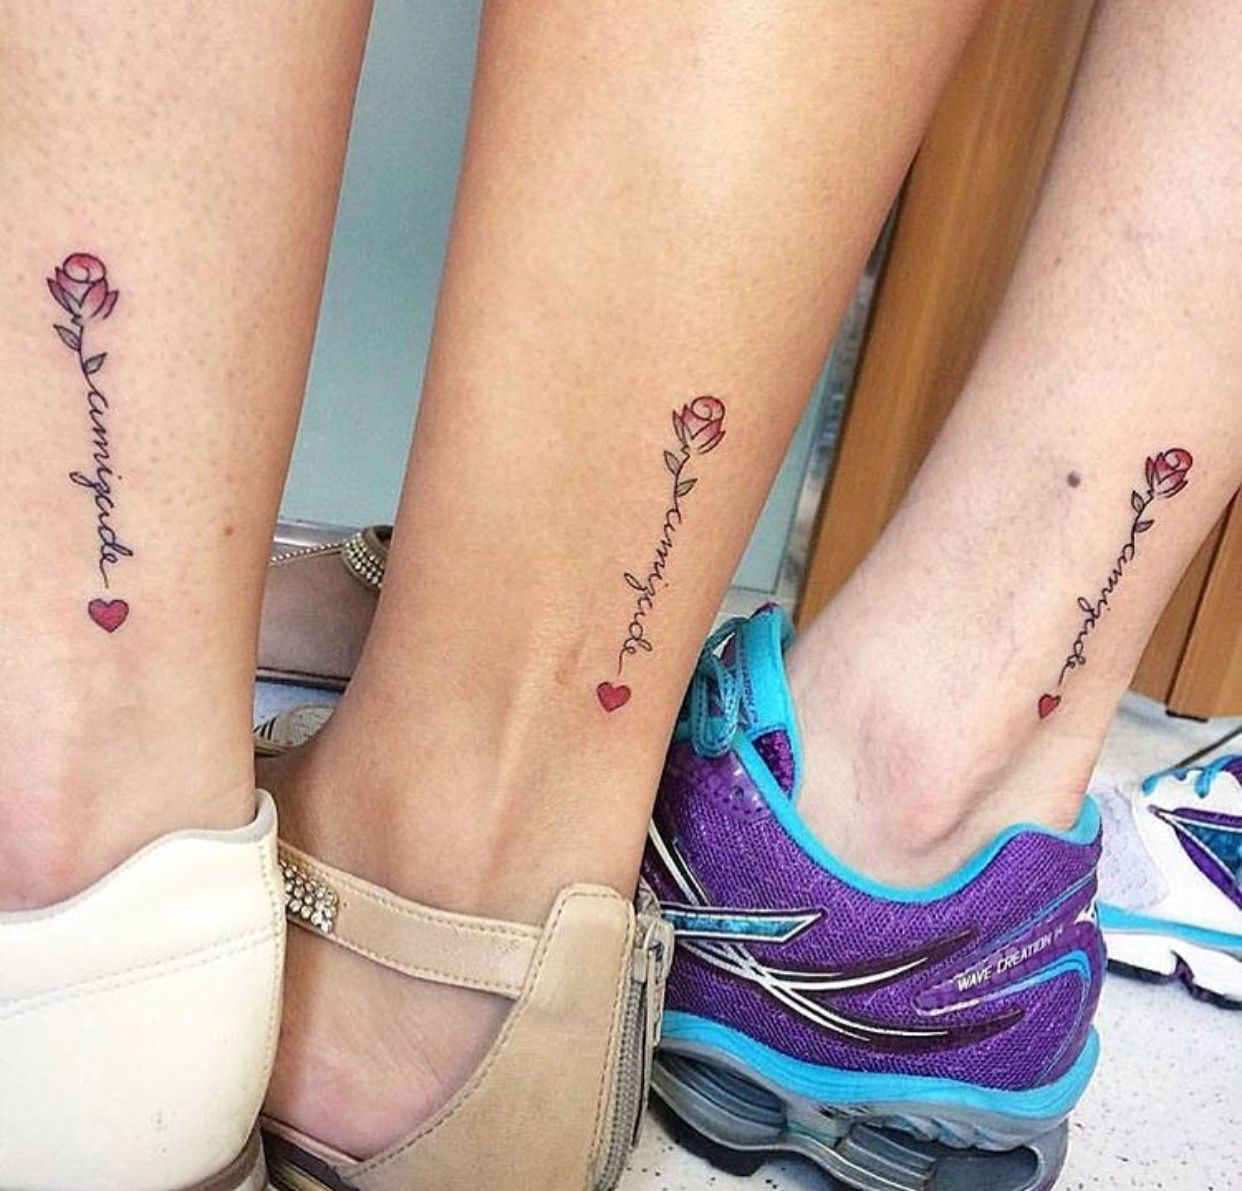 Pin De Heike Huismann Em Tattoos Tatuagem Feminina Para